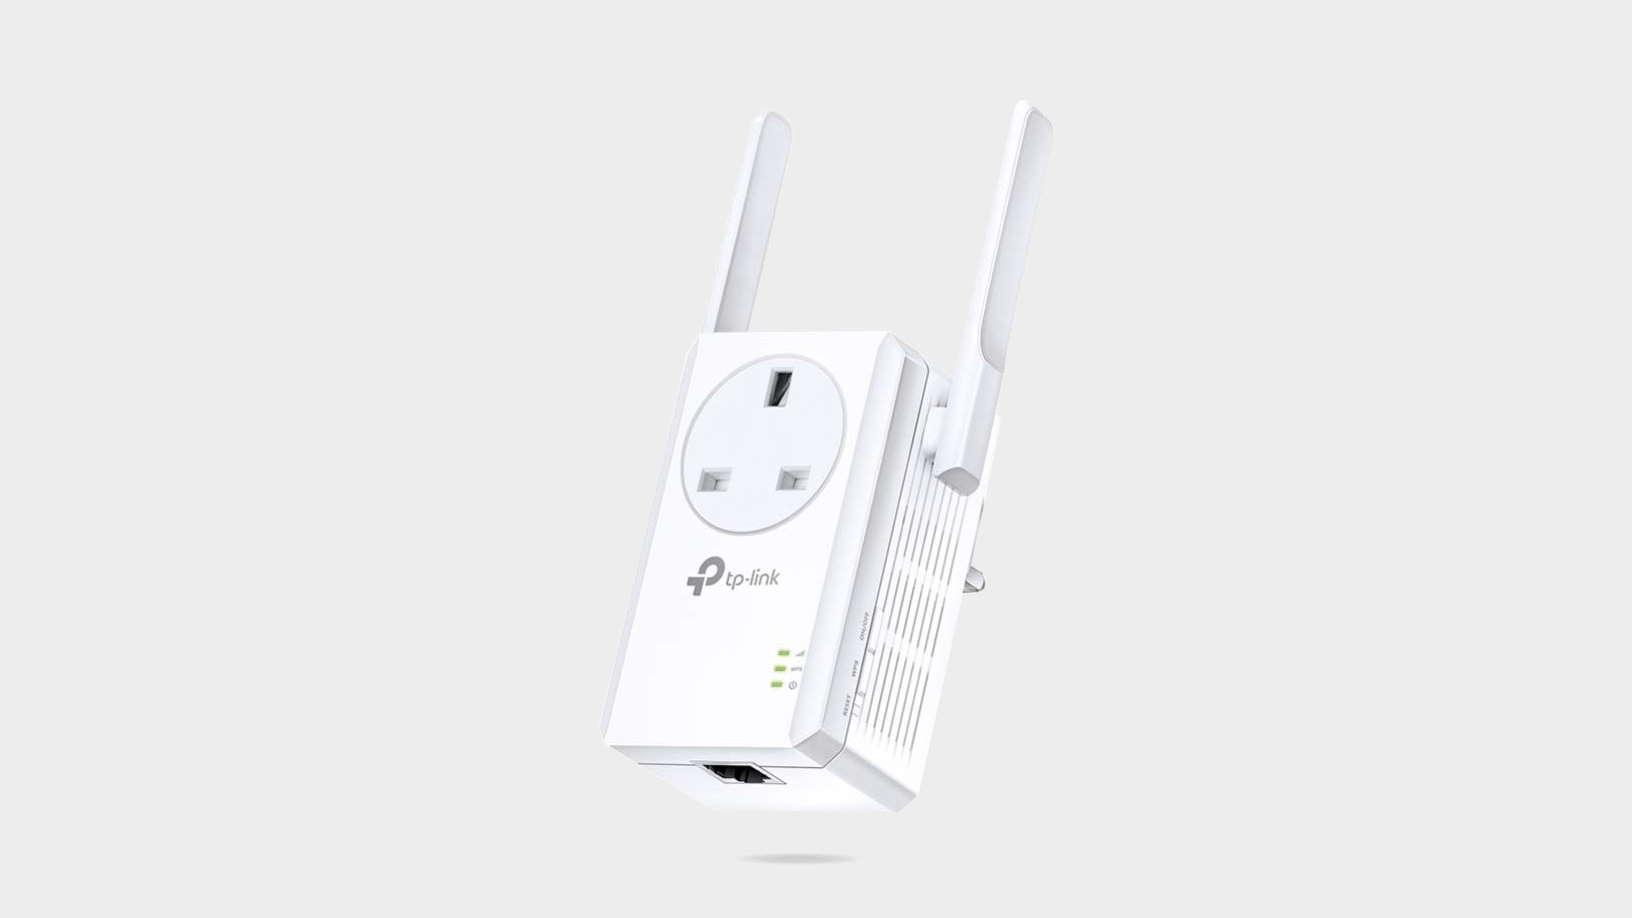 TP link TL-WA860RE Wi-Fi range extender